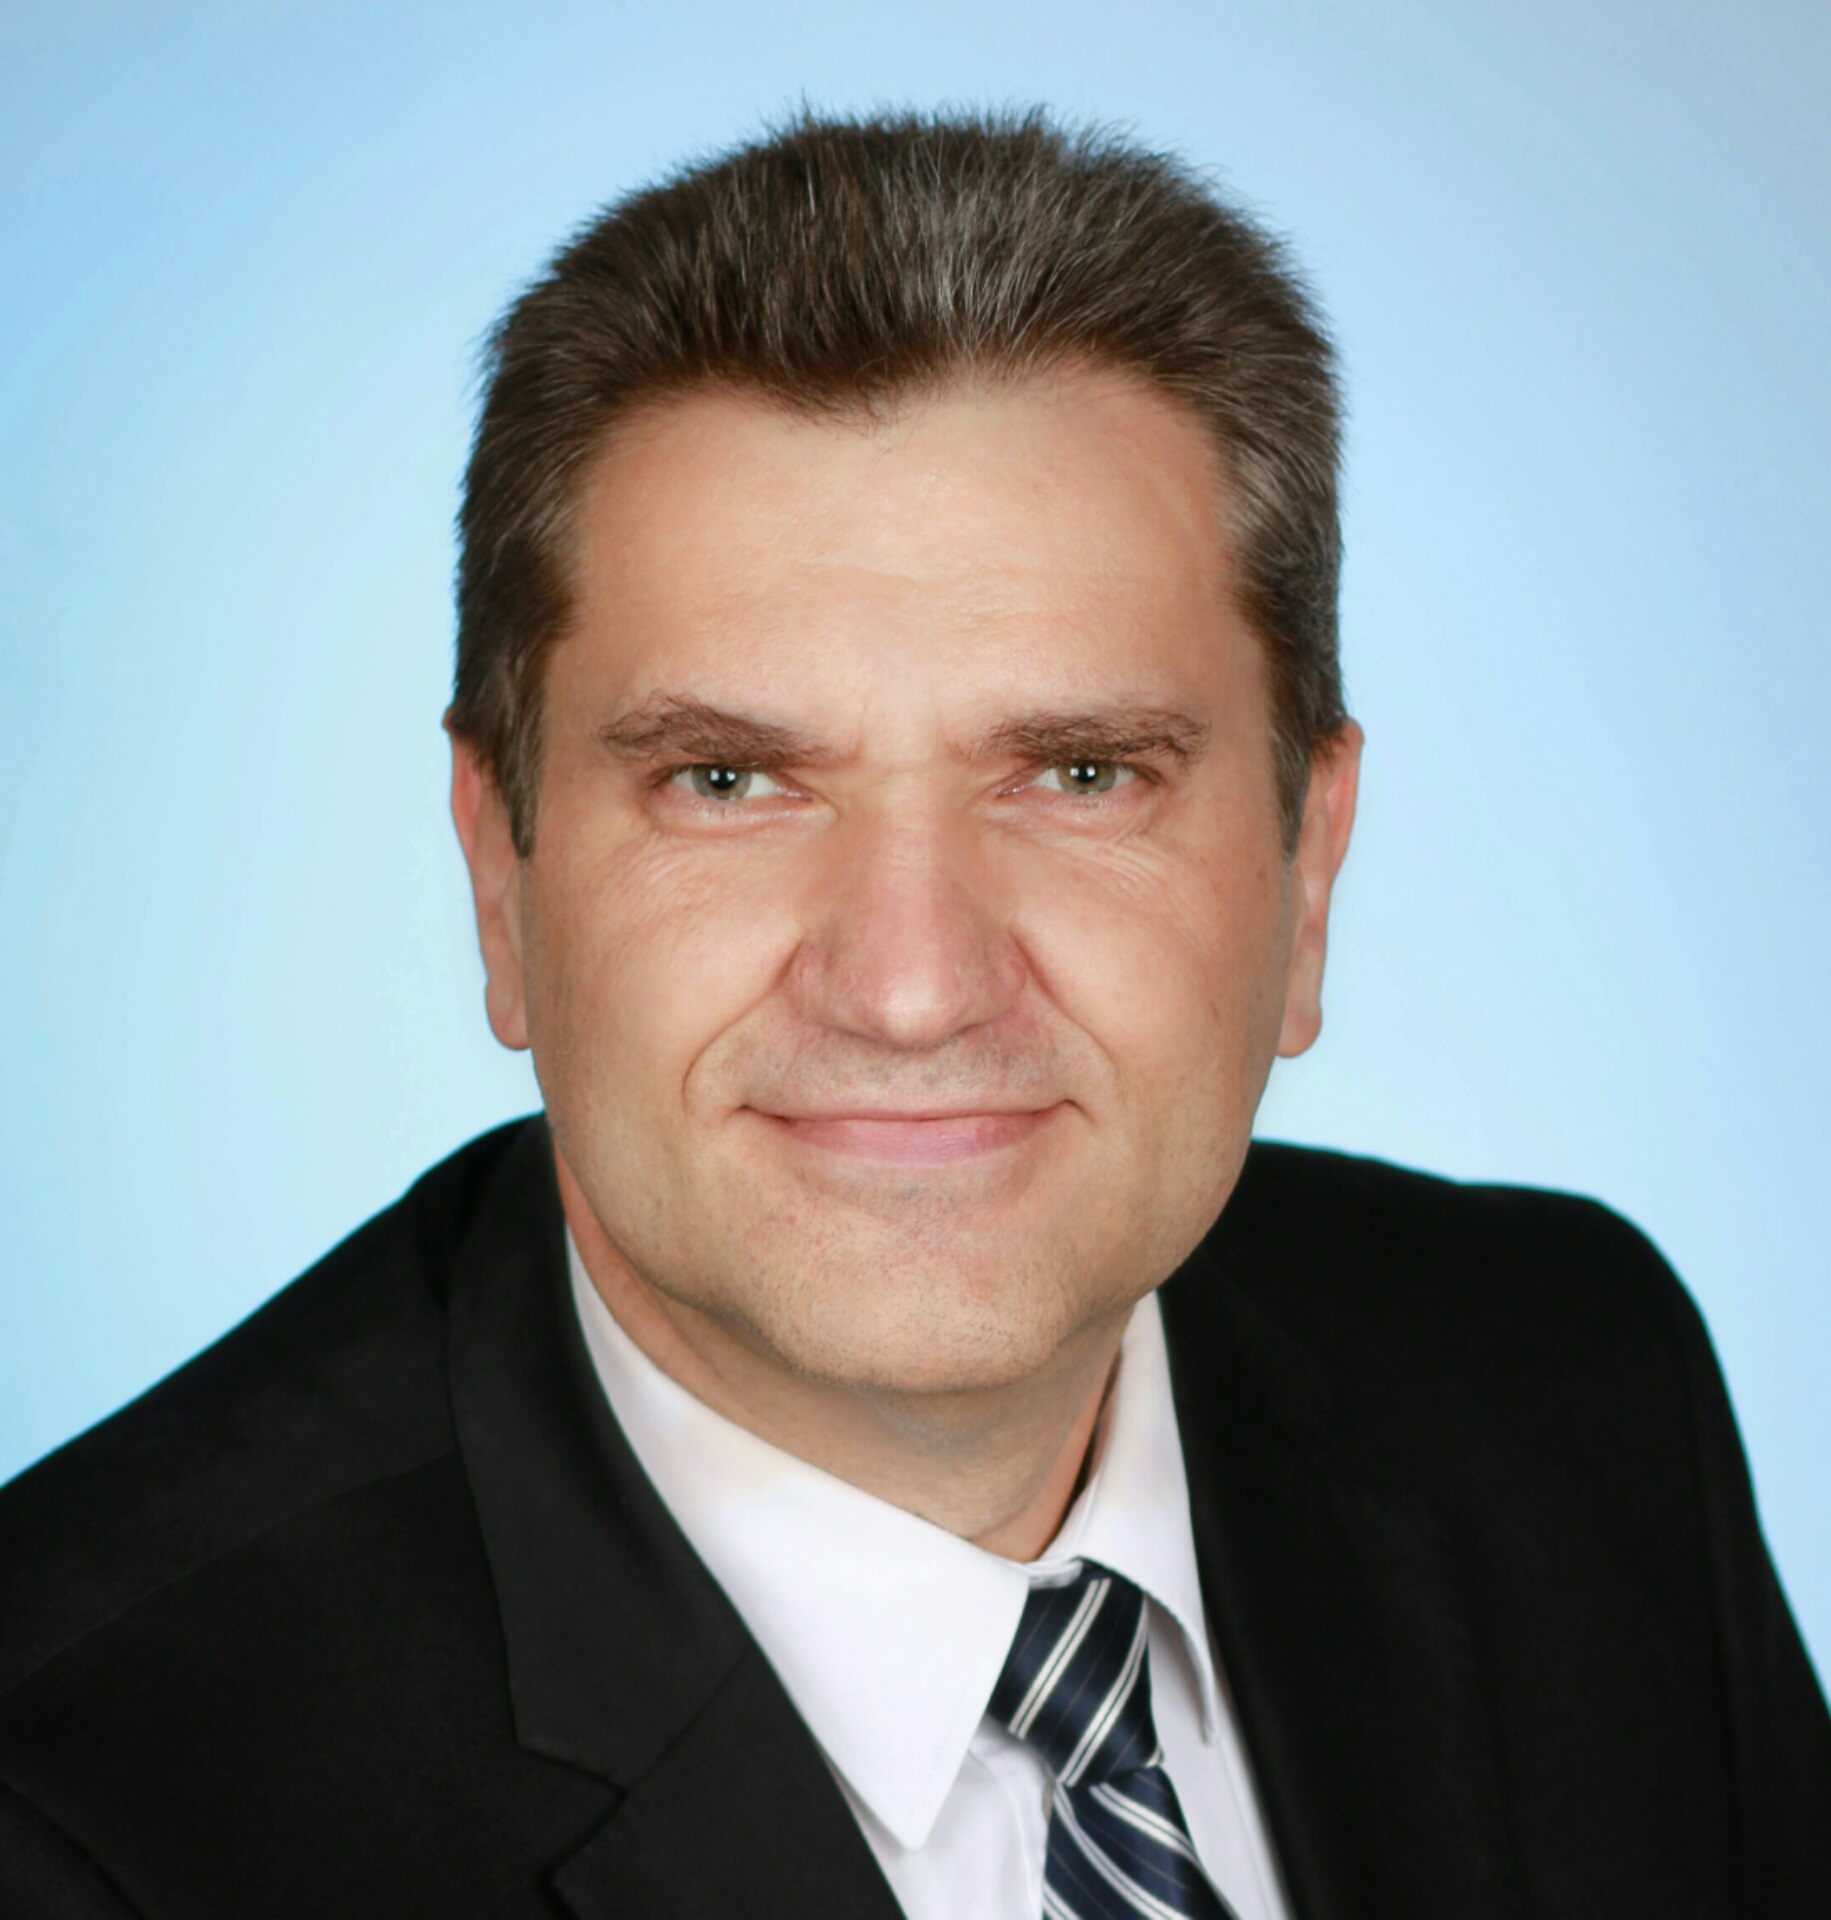 Erwin Mari